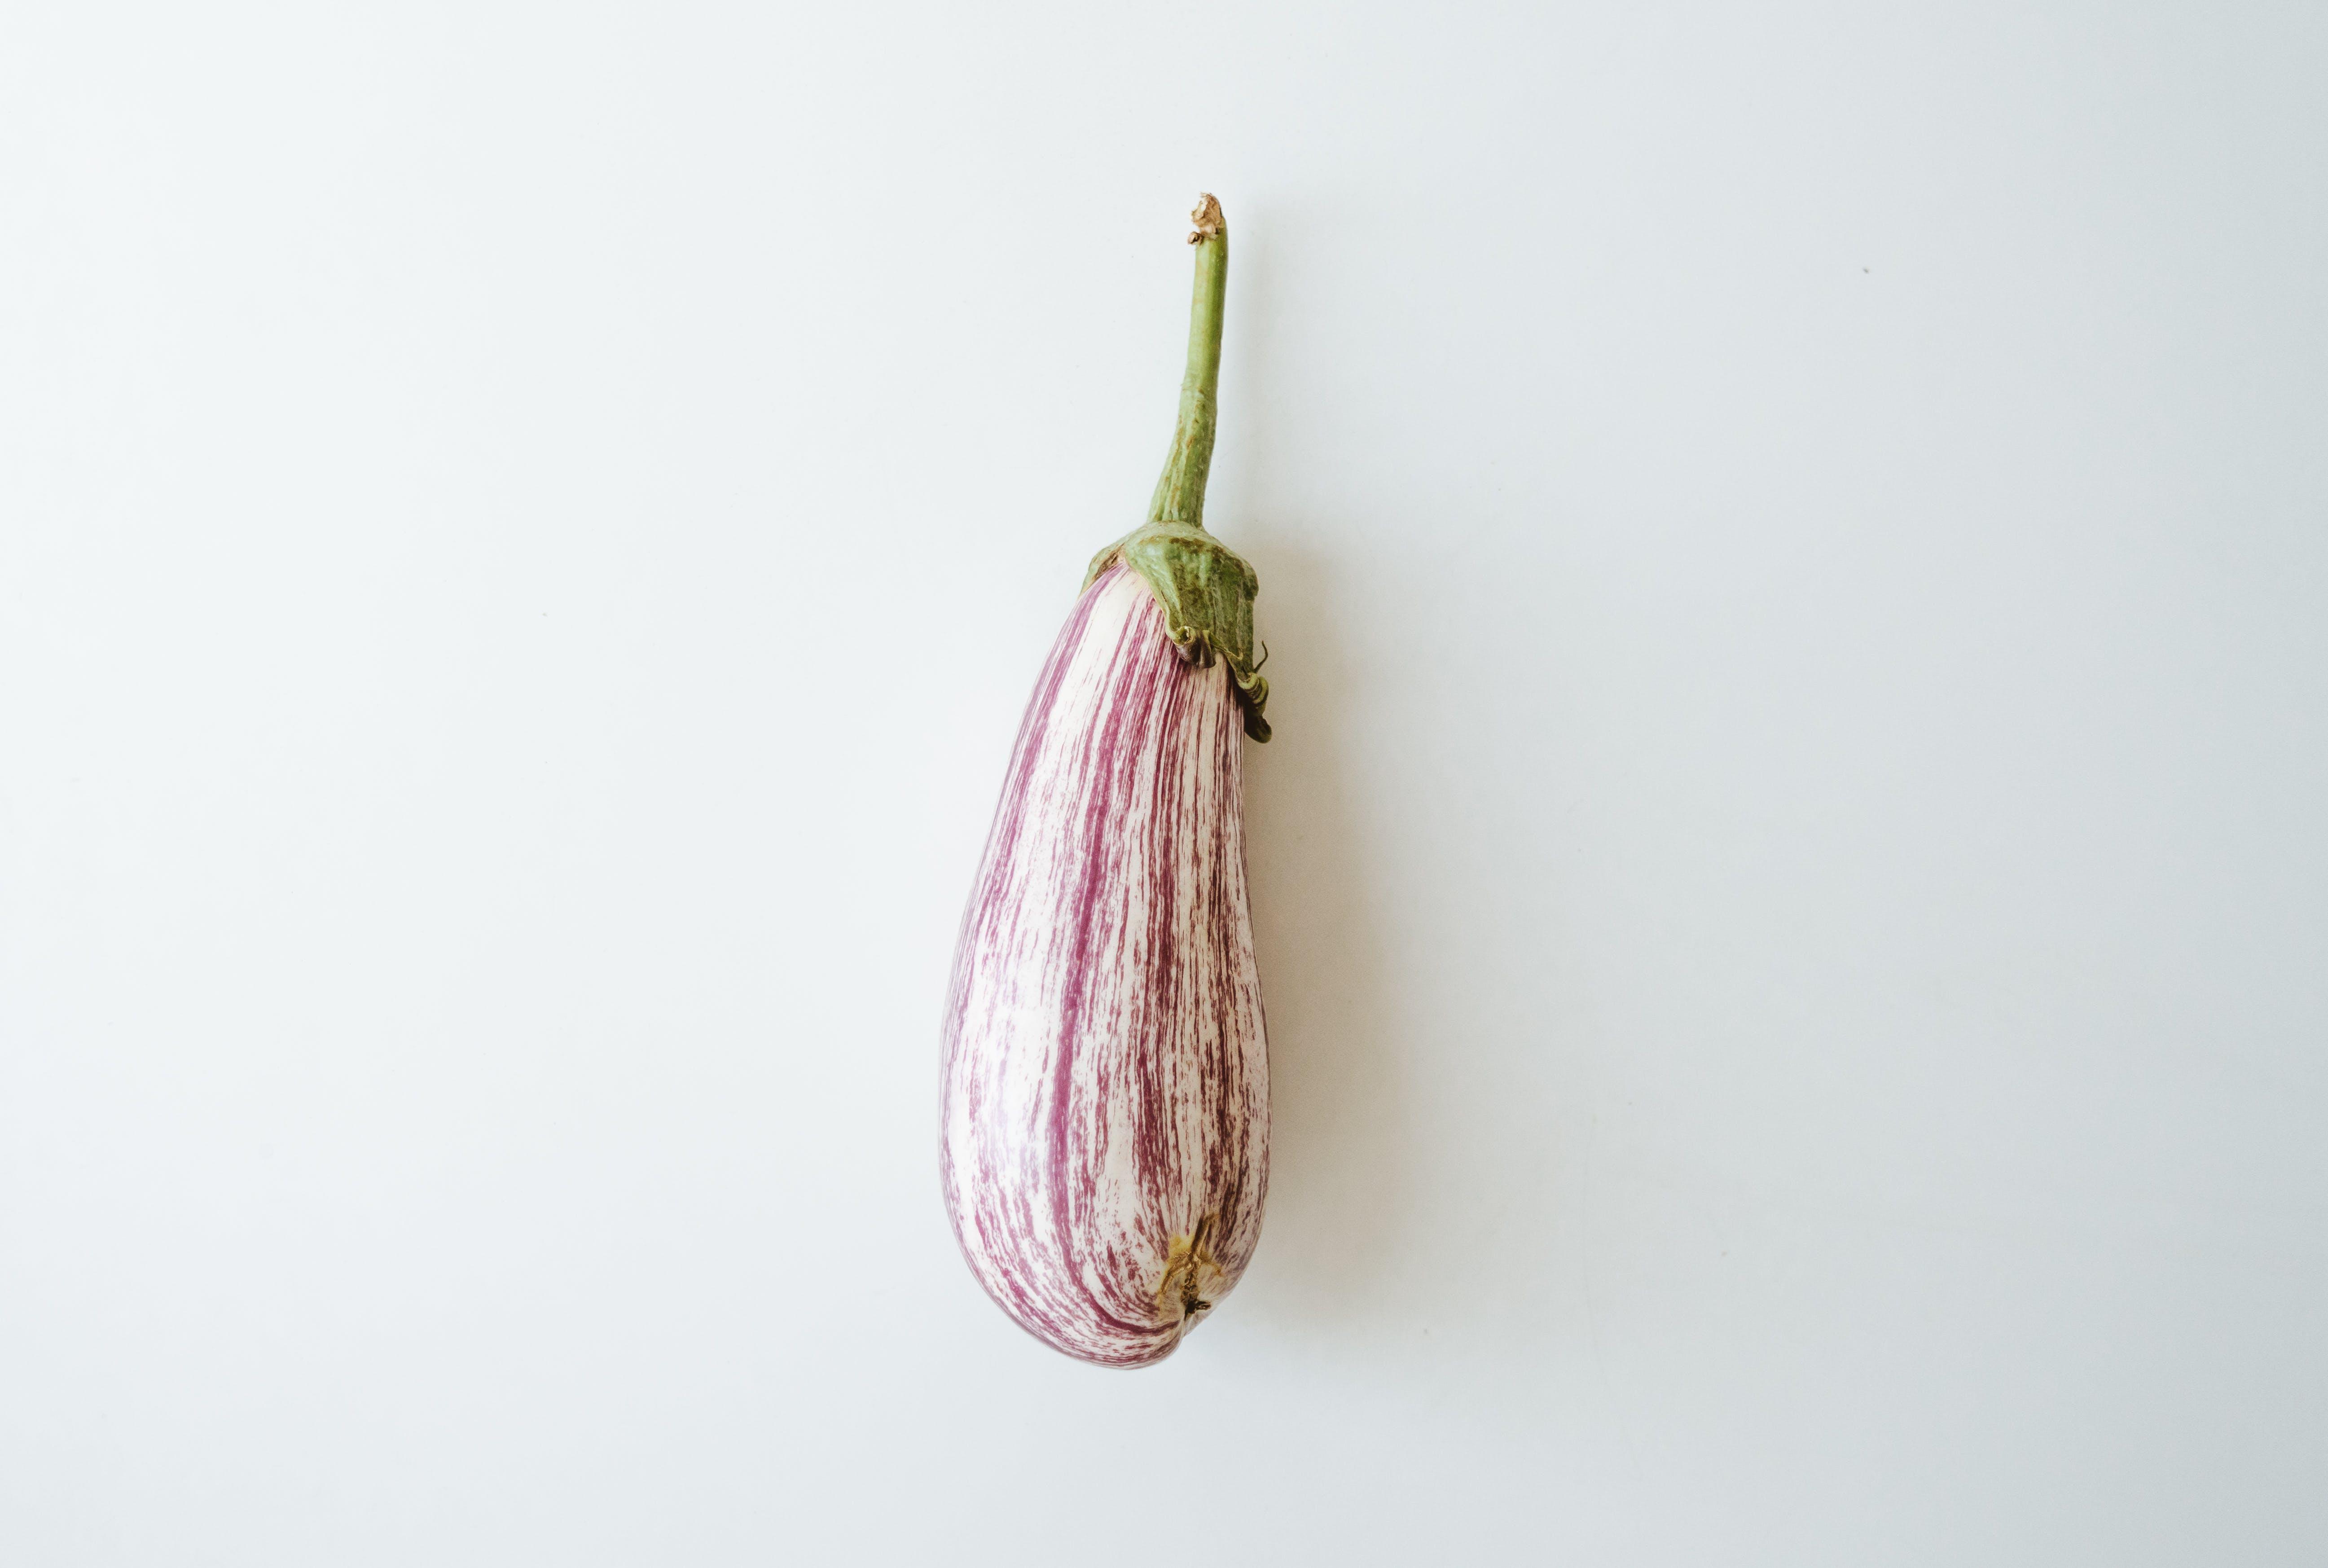 White And Purple Eggplant